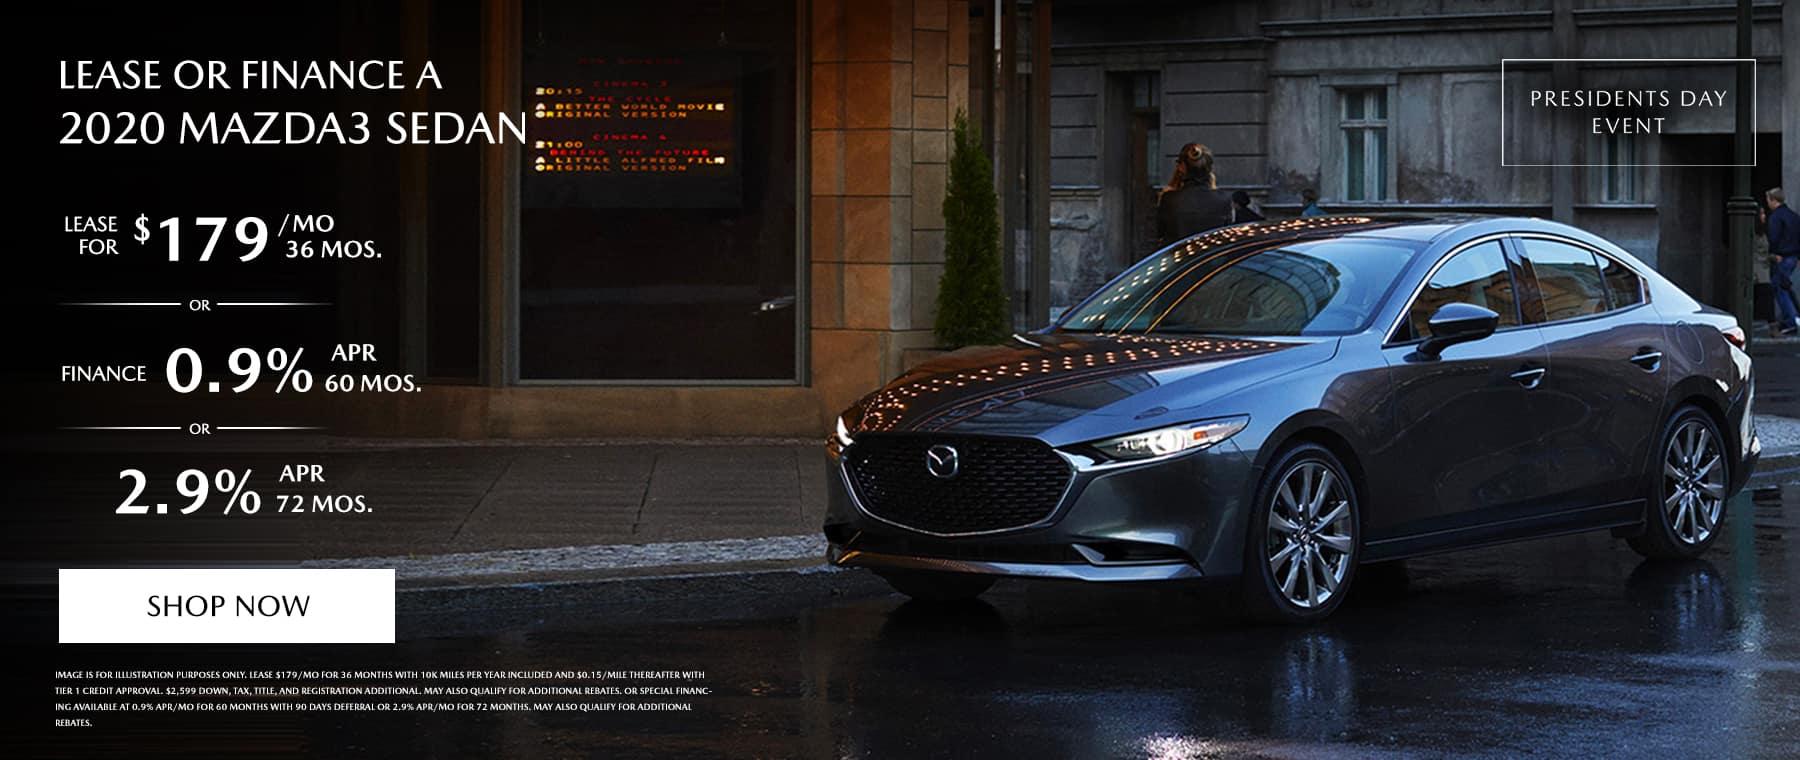 2020 Mazda3 Sedan Lease FInance